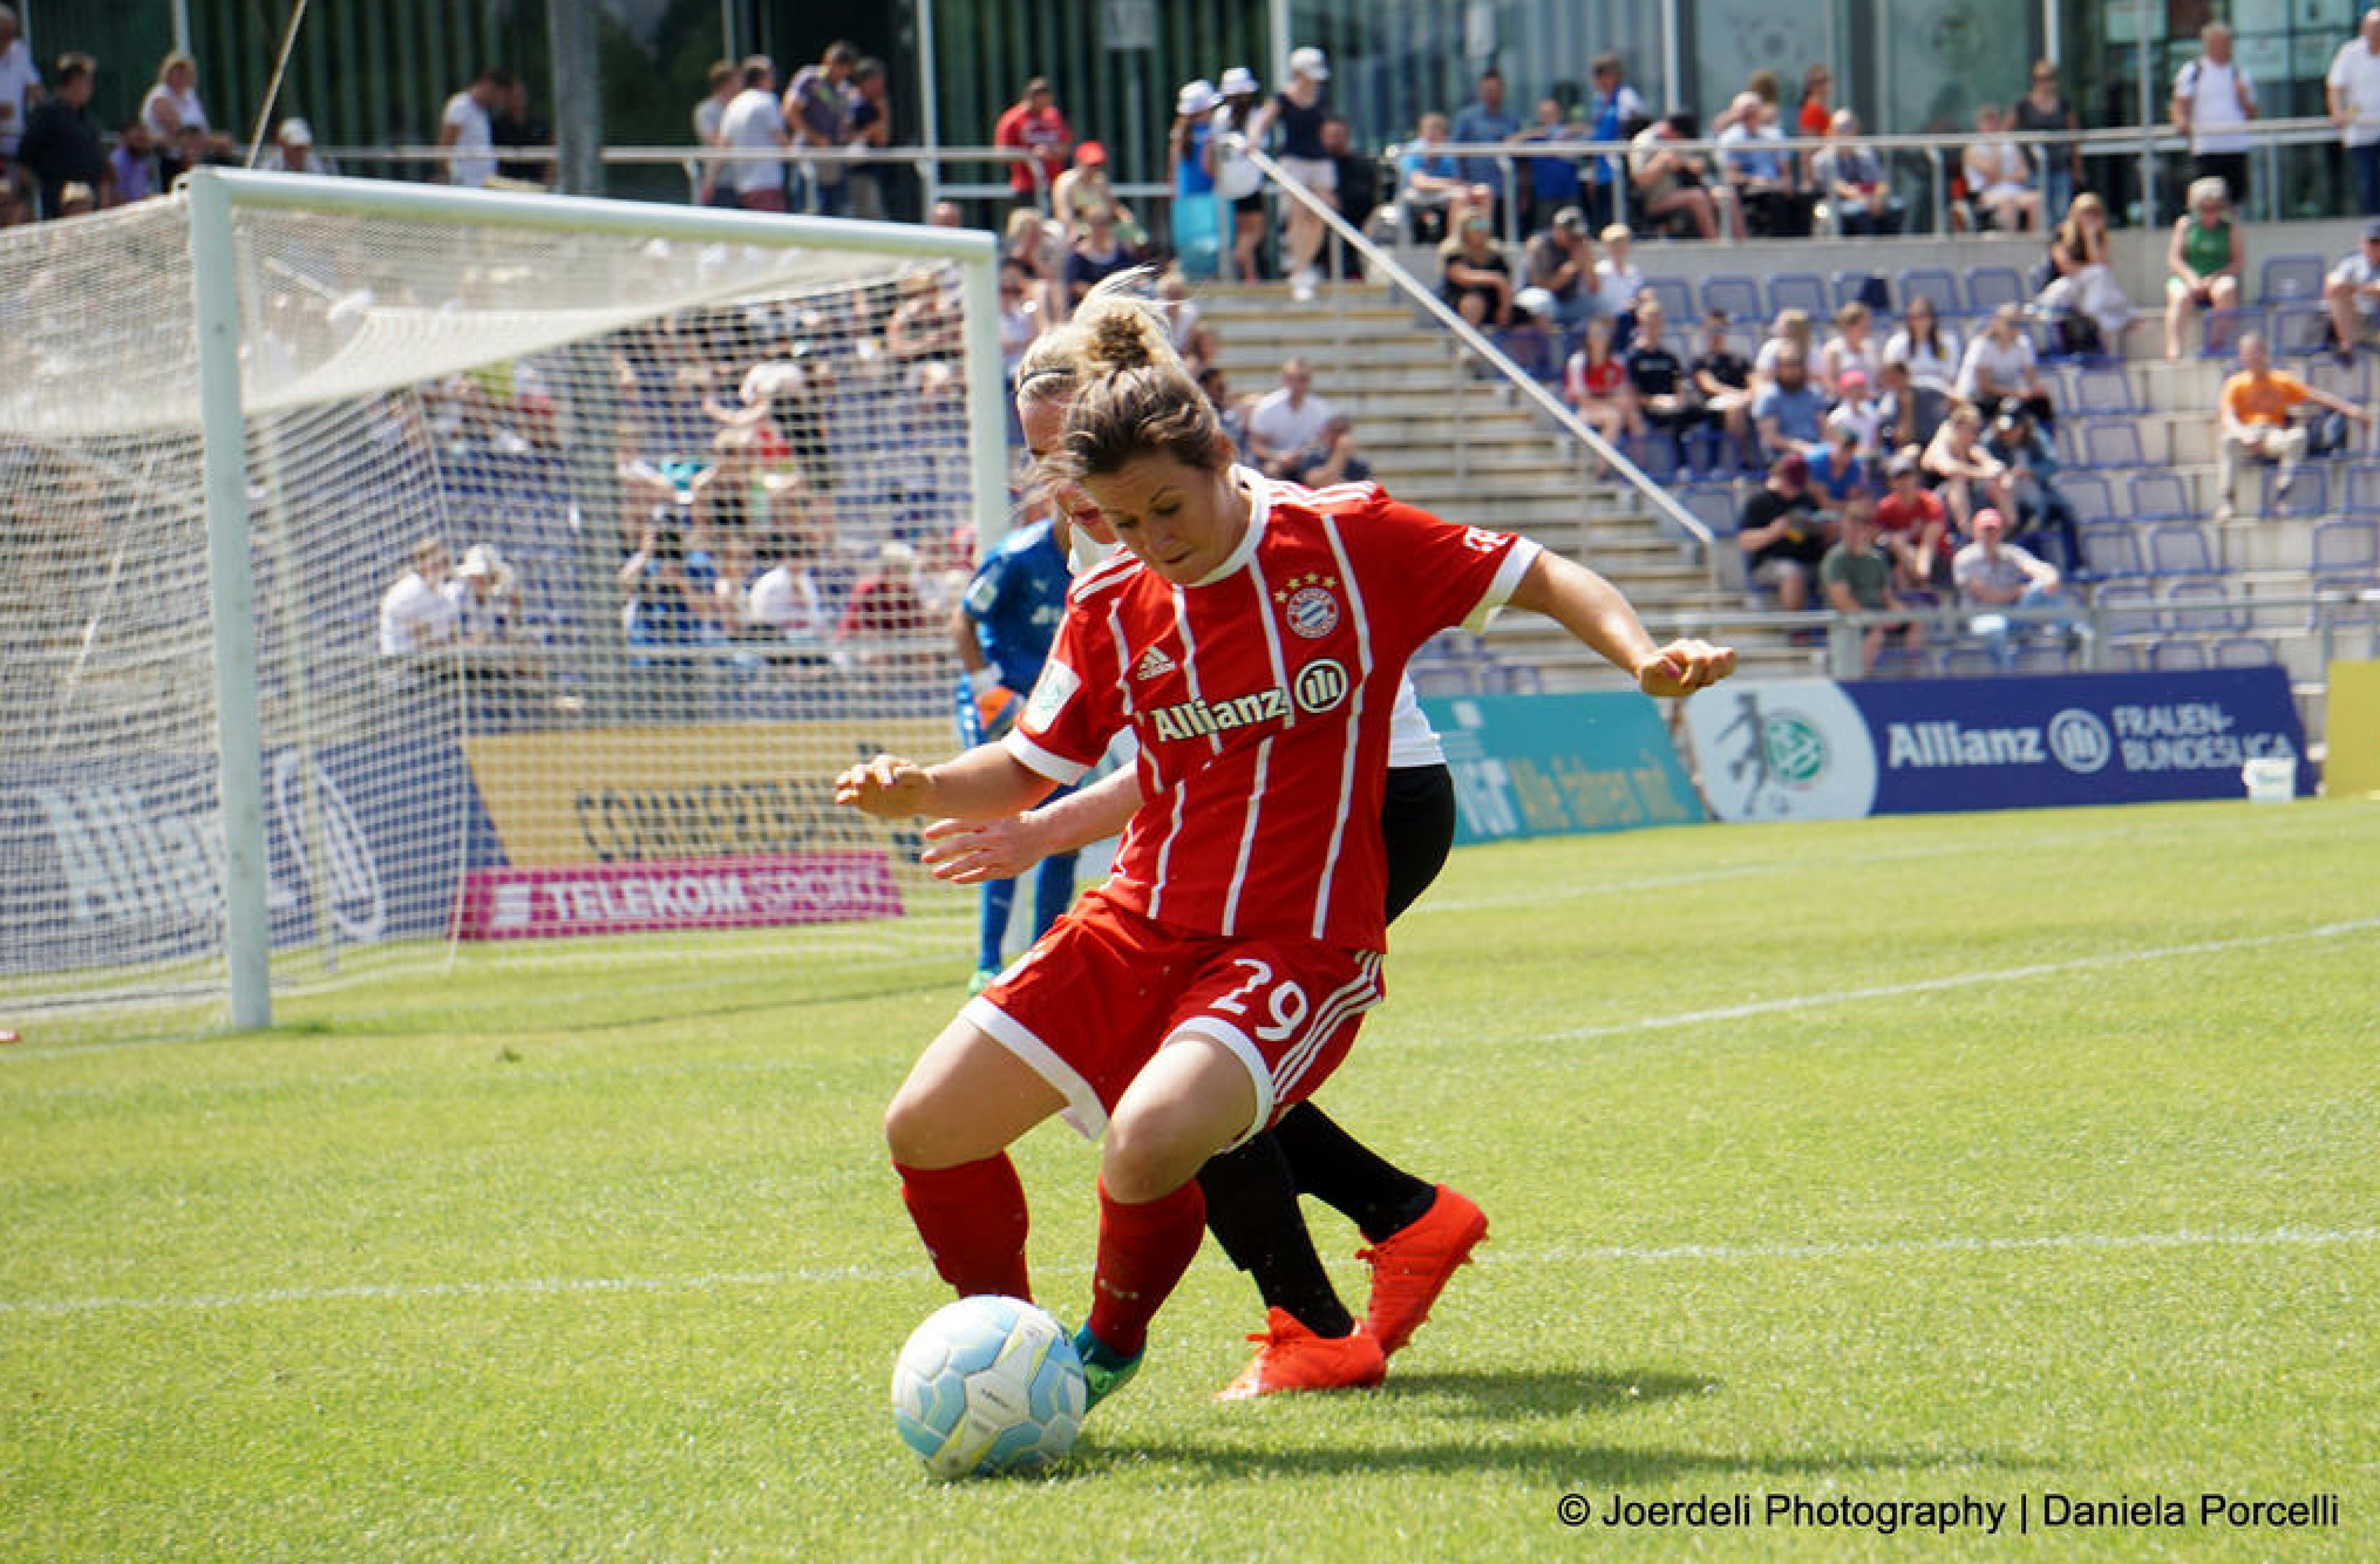 Frauen-Bundesliga week 2 review: Hoffenheim continue to impress